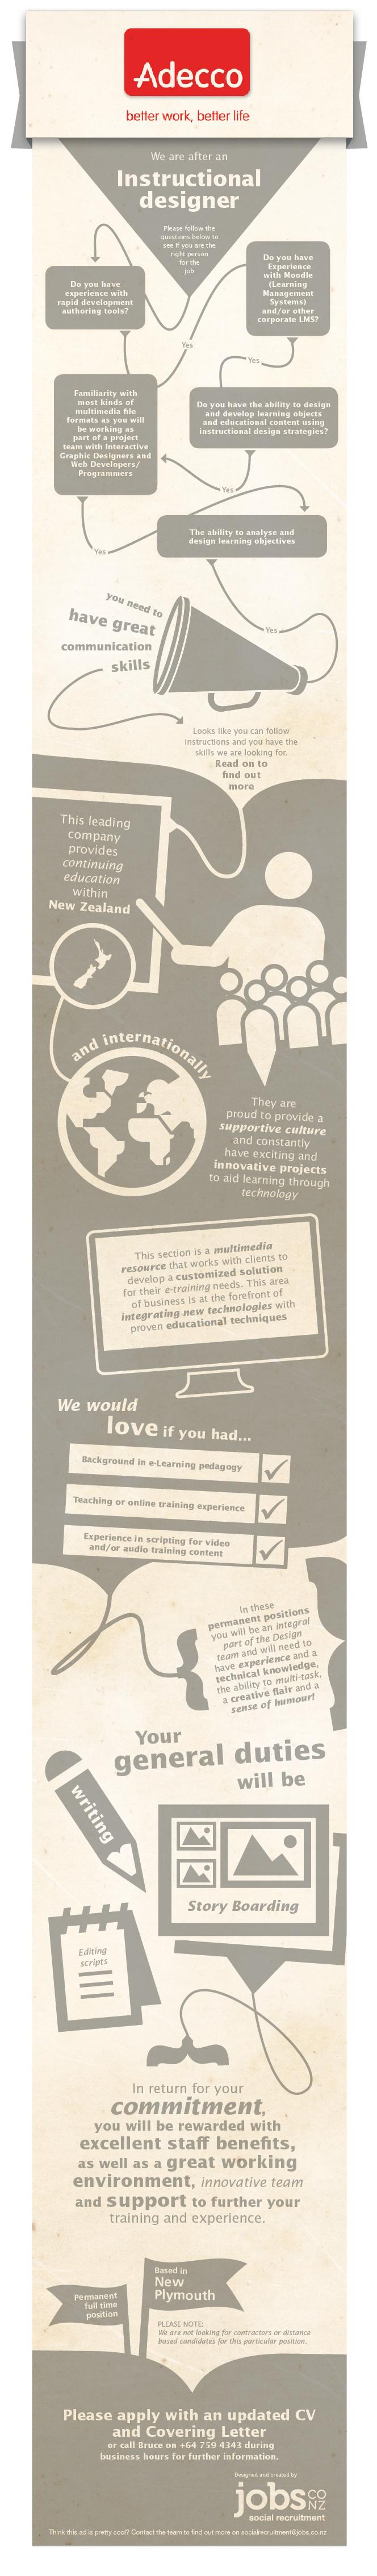 A Unique Job Posting For An Instructional Designer Through Adecco Showcasing The Qualities They Are Looking For Hrd Instructional Design Job Ads Job Posting